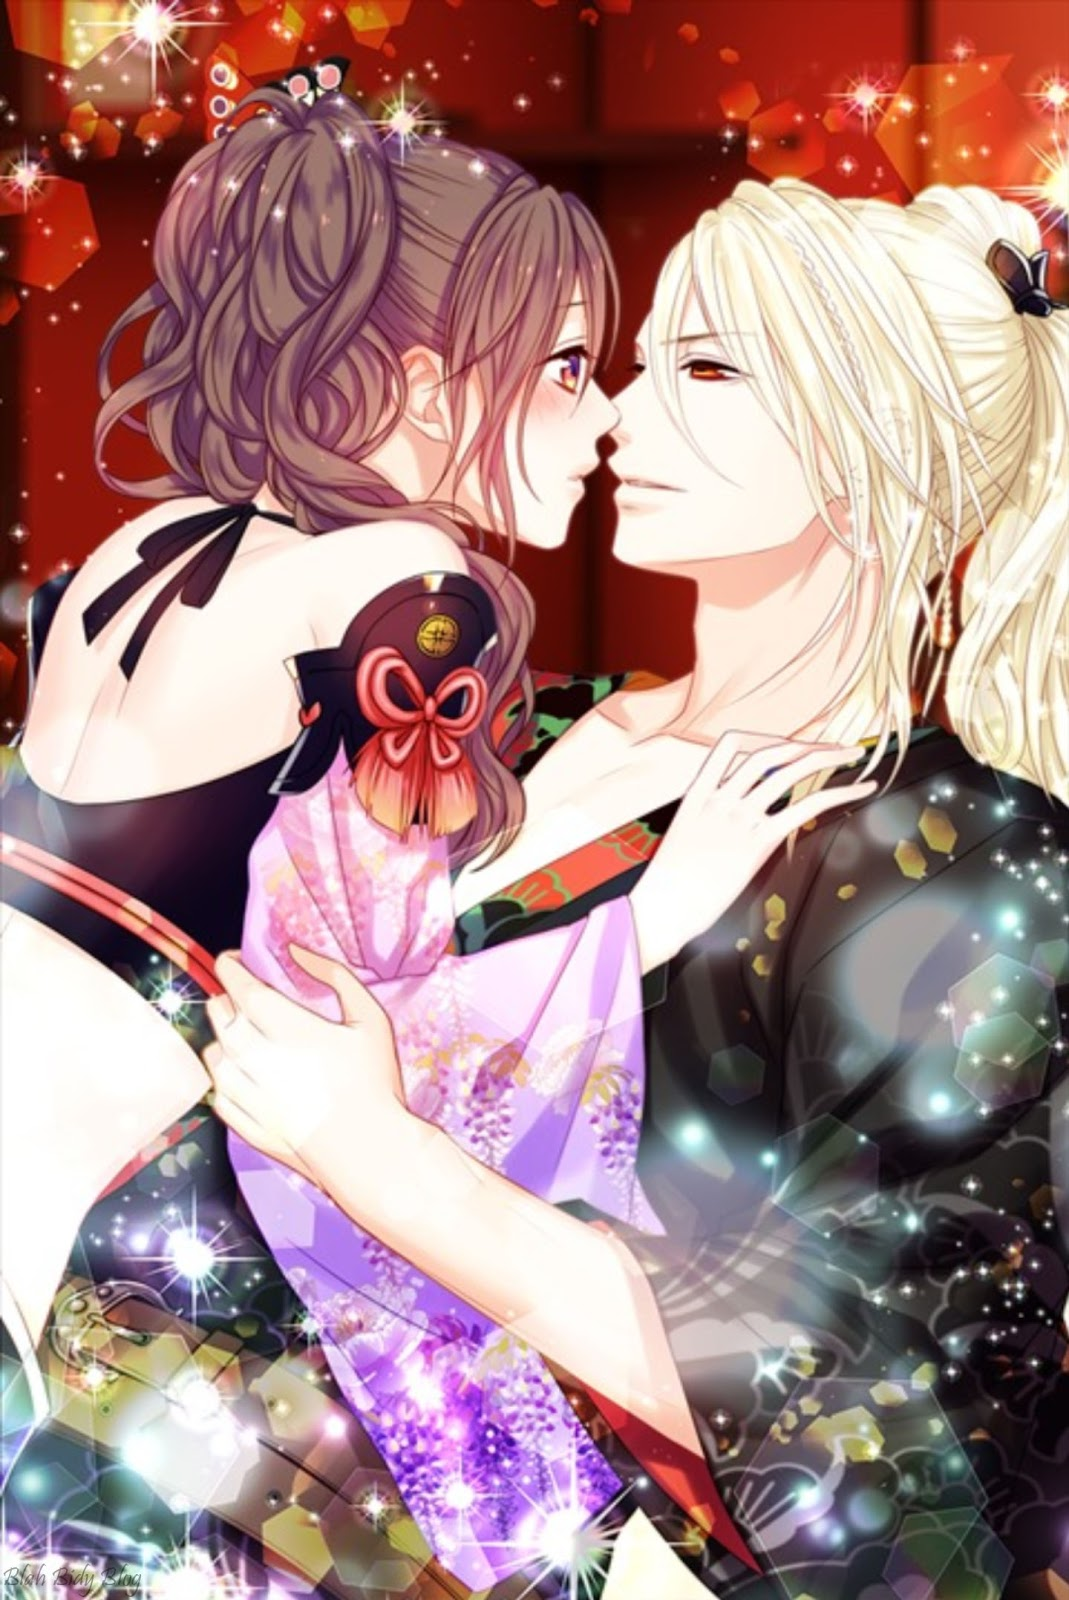 Shall we date walkthrough Shall we date? Love Tangle - Naoki Hozumi : Main story /Chapter 2 ...